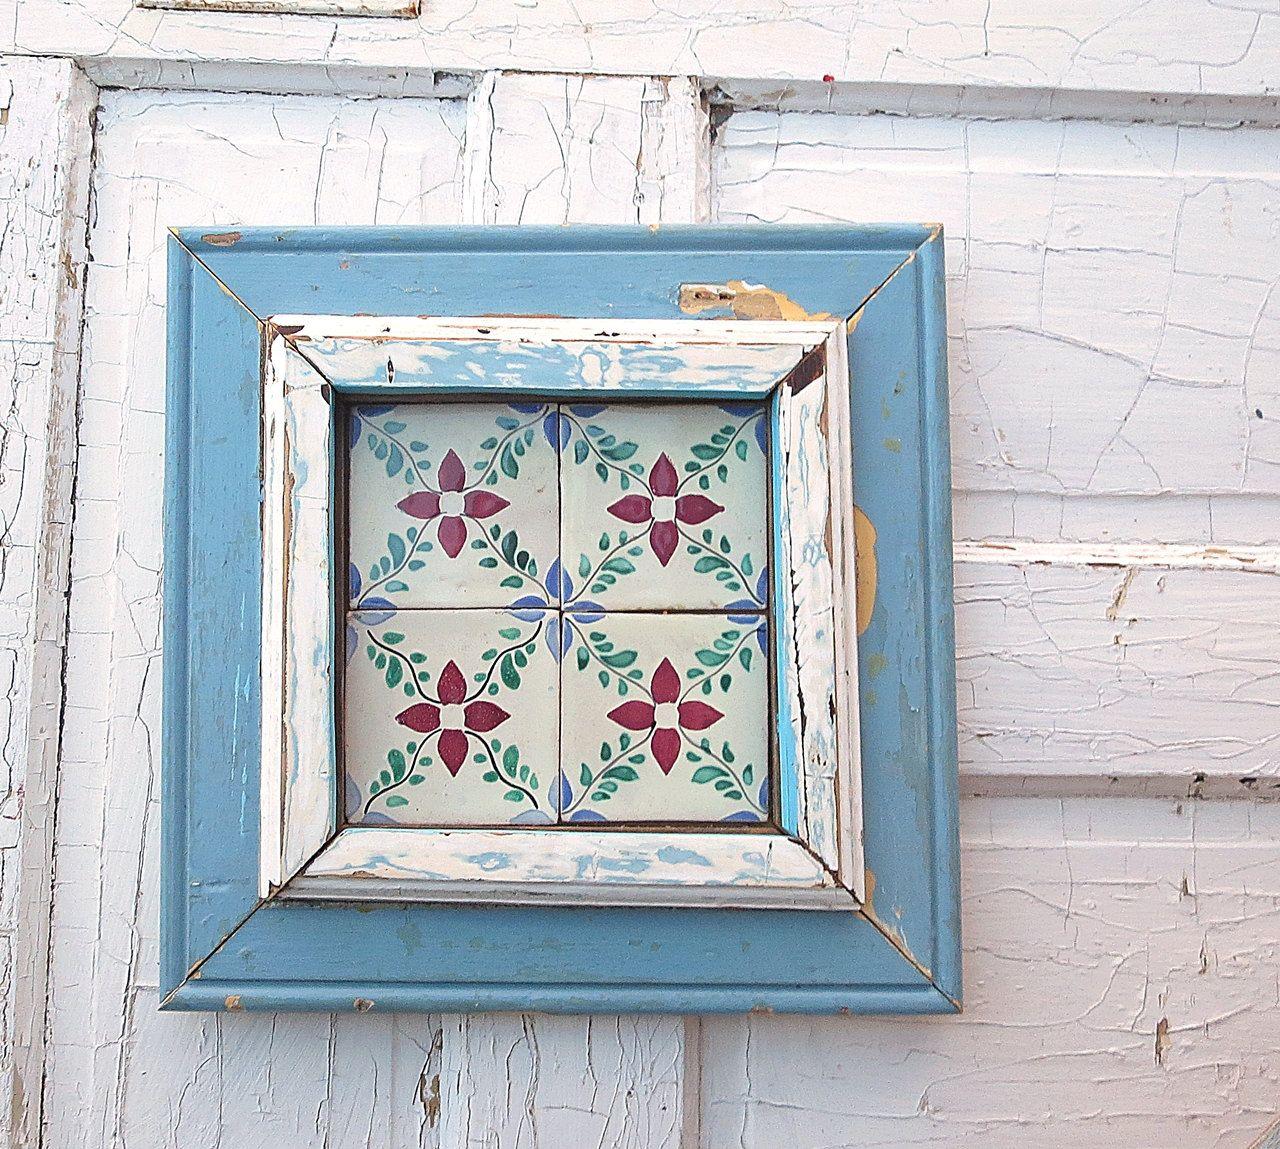 Reclaimed wood art rustic decor wood wall art blue tile wall reclaimed wood art rustic decor wood wall art blue tile wall decor ceramic tile art reclaimed wood home decor rustic wall decor dailygadgetfo Images